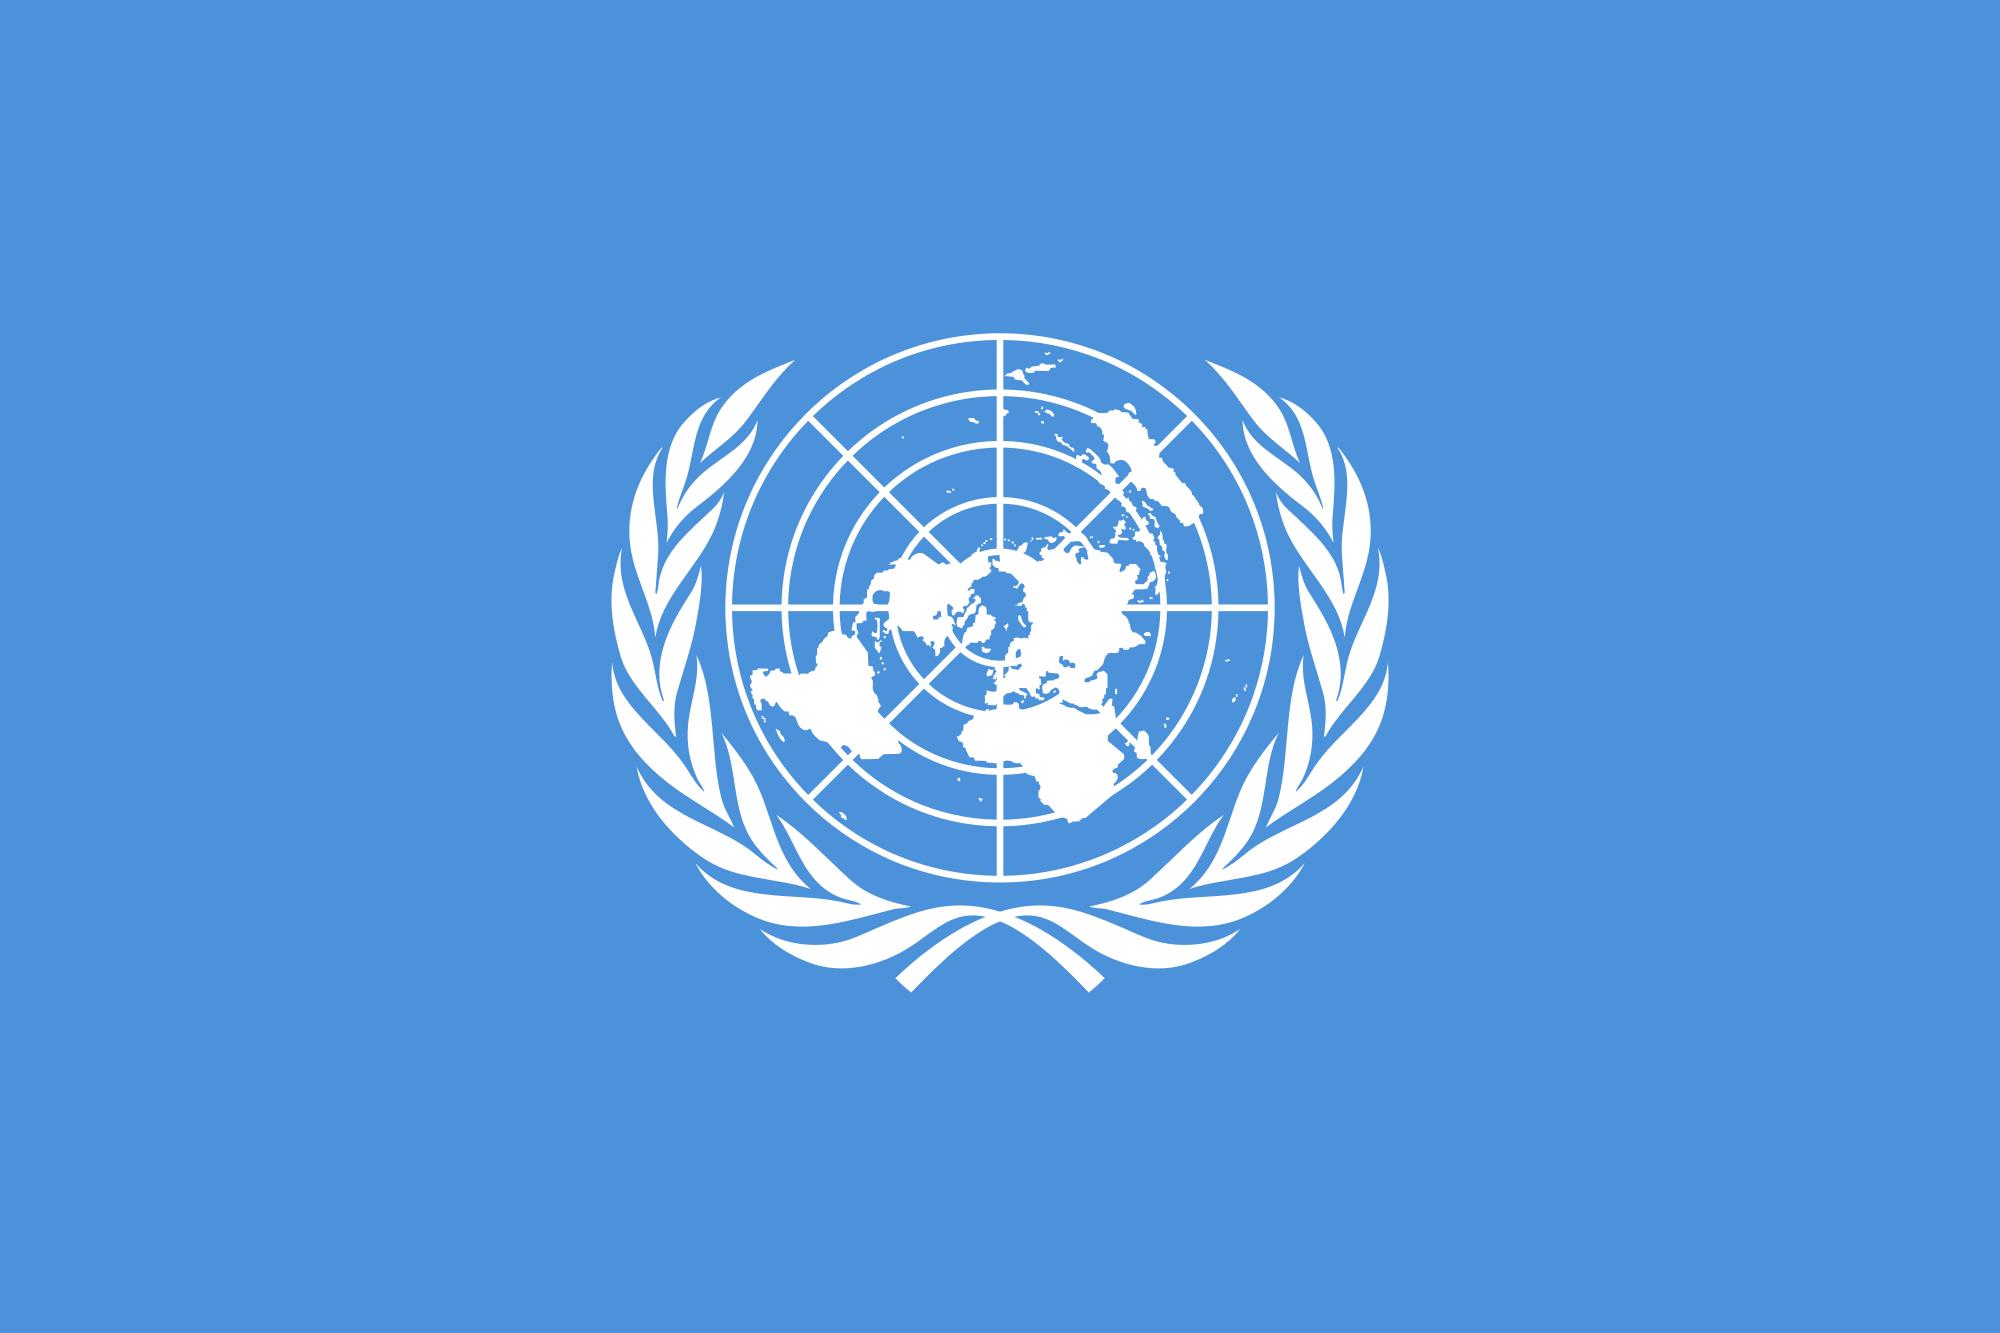 un-file-flag